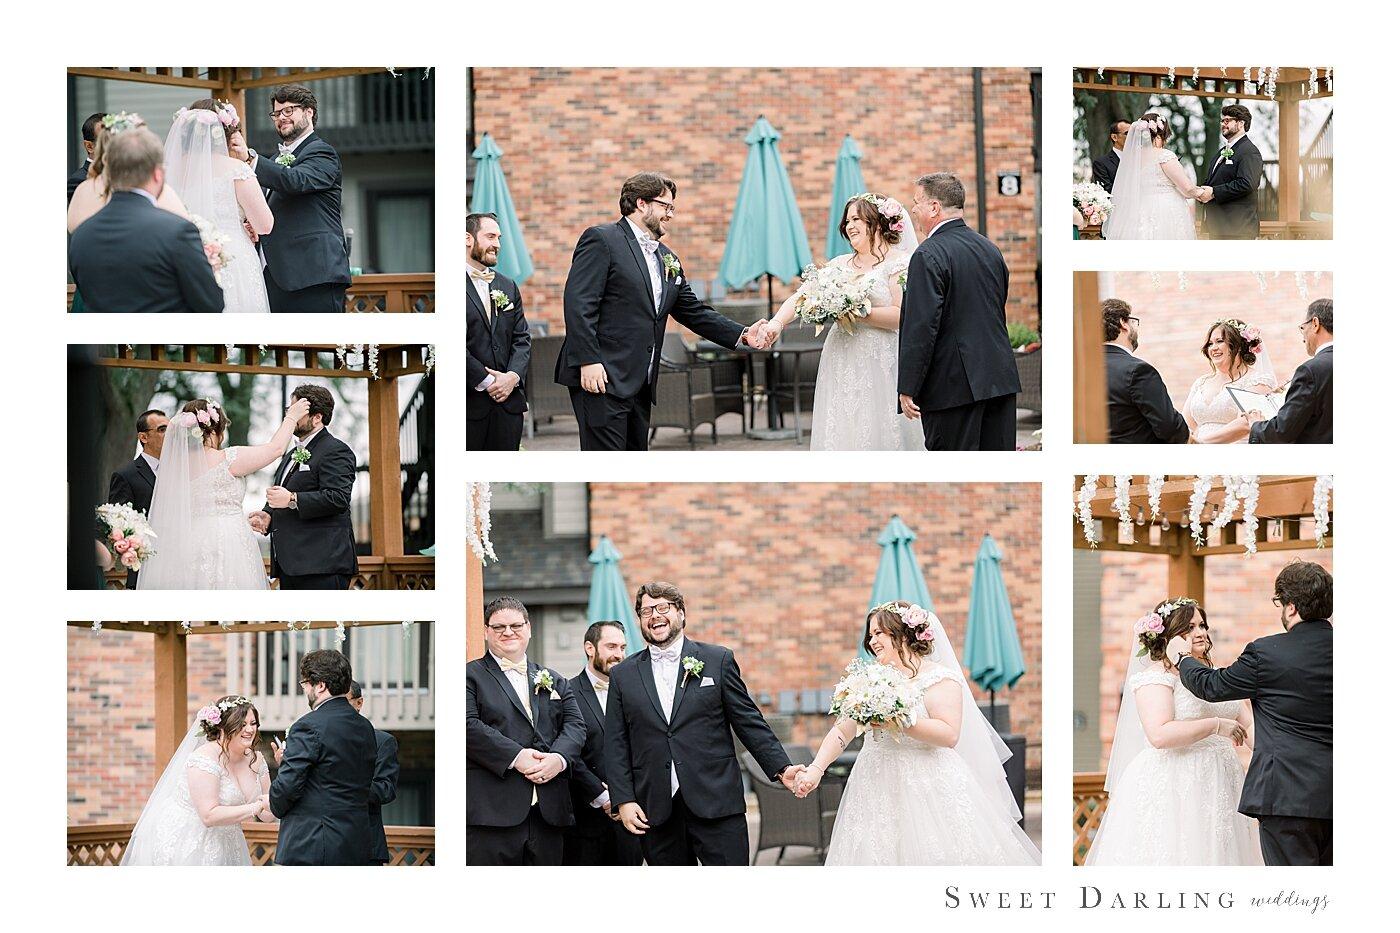 Bloomington-Normal-IL-Wedding-Photographer-eastland-suites-hotel_0019.jpg